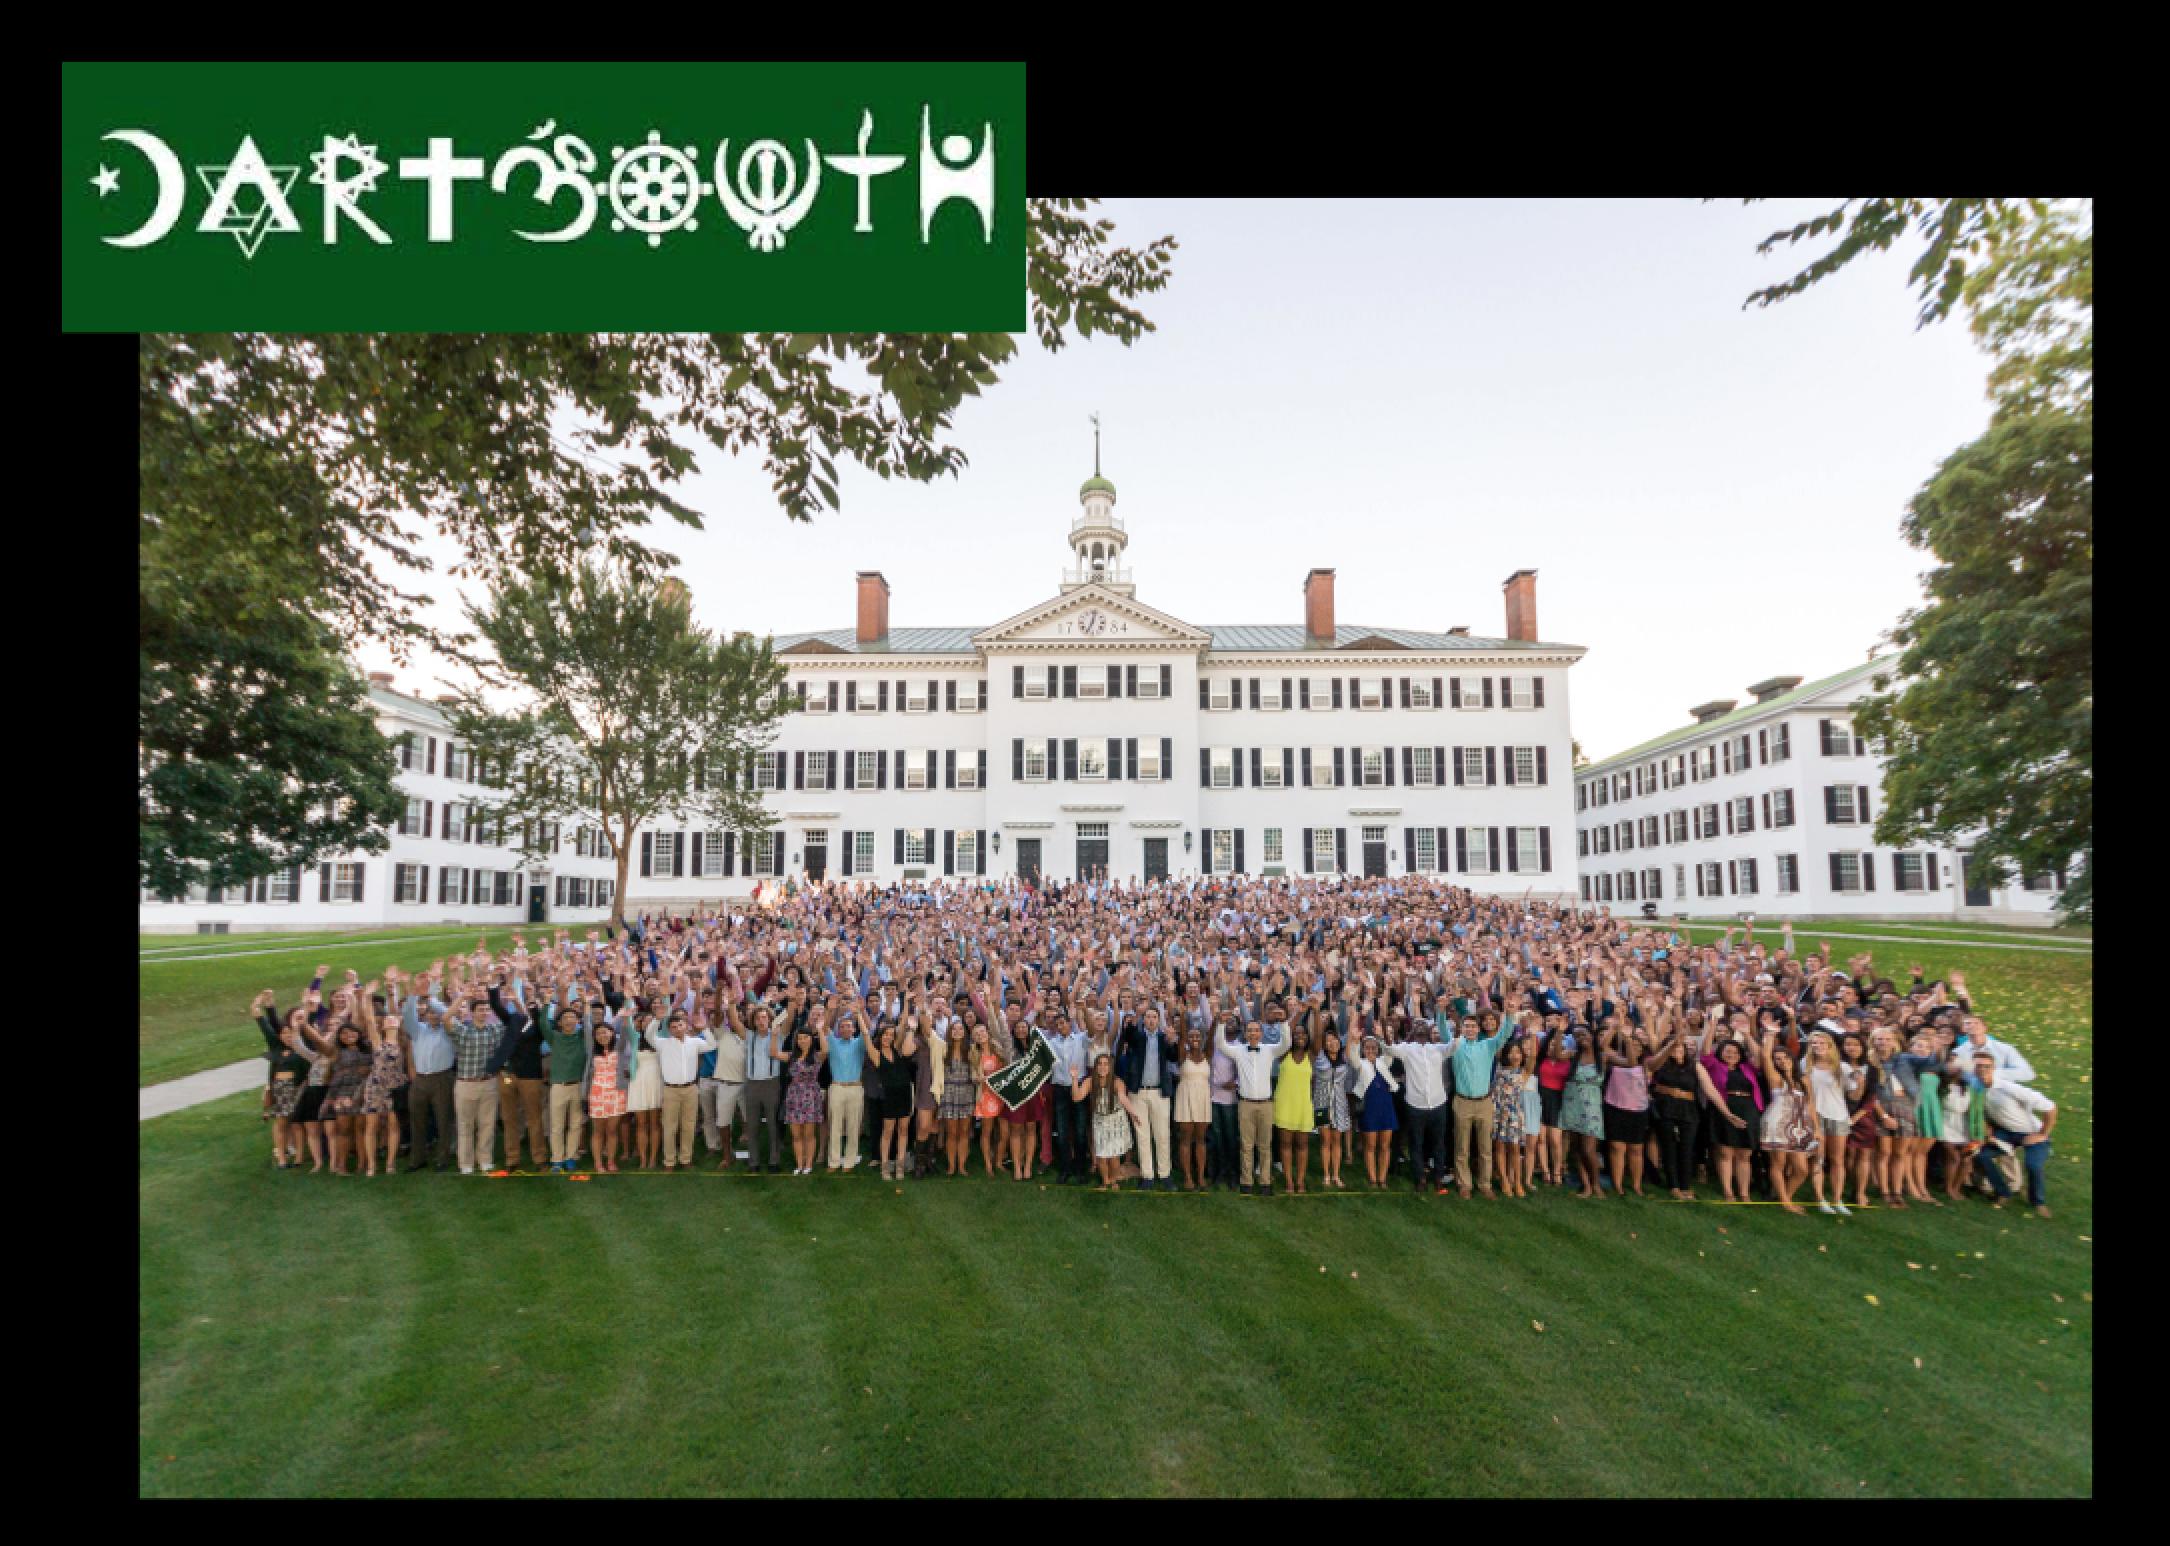 Dartmouth admissions essay